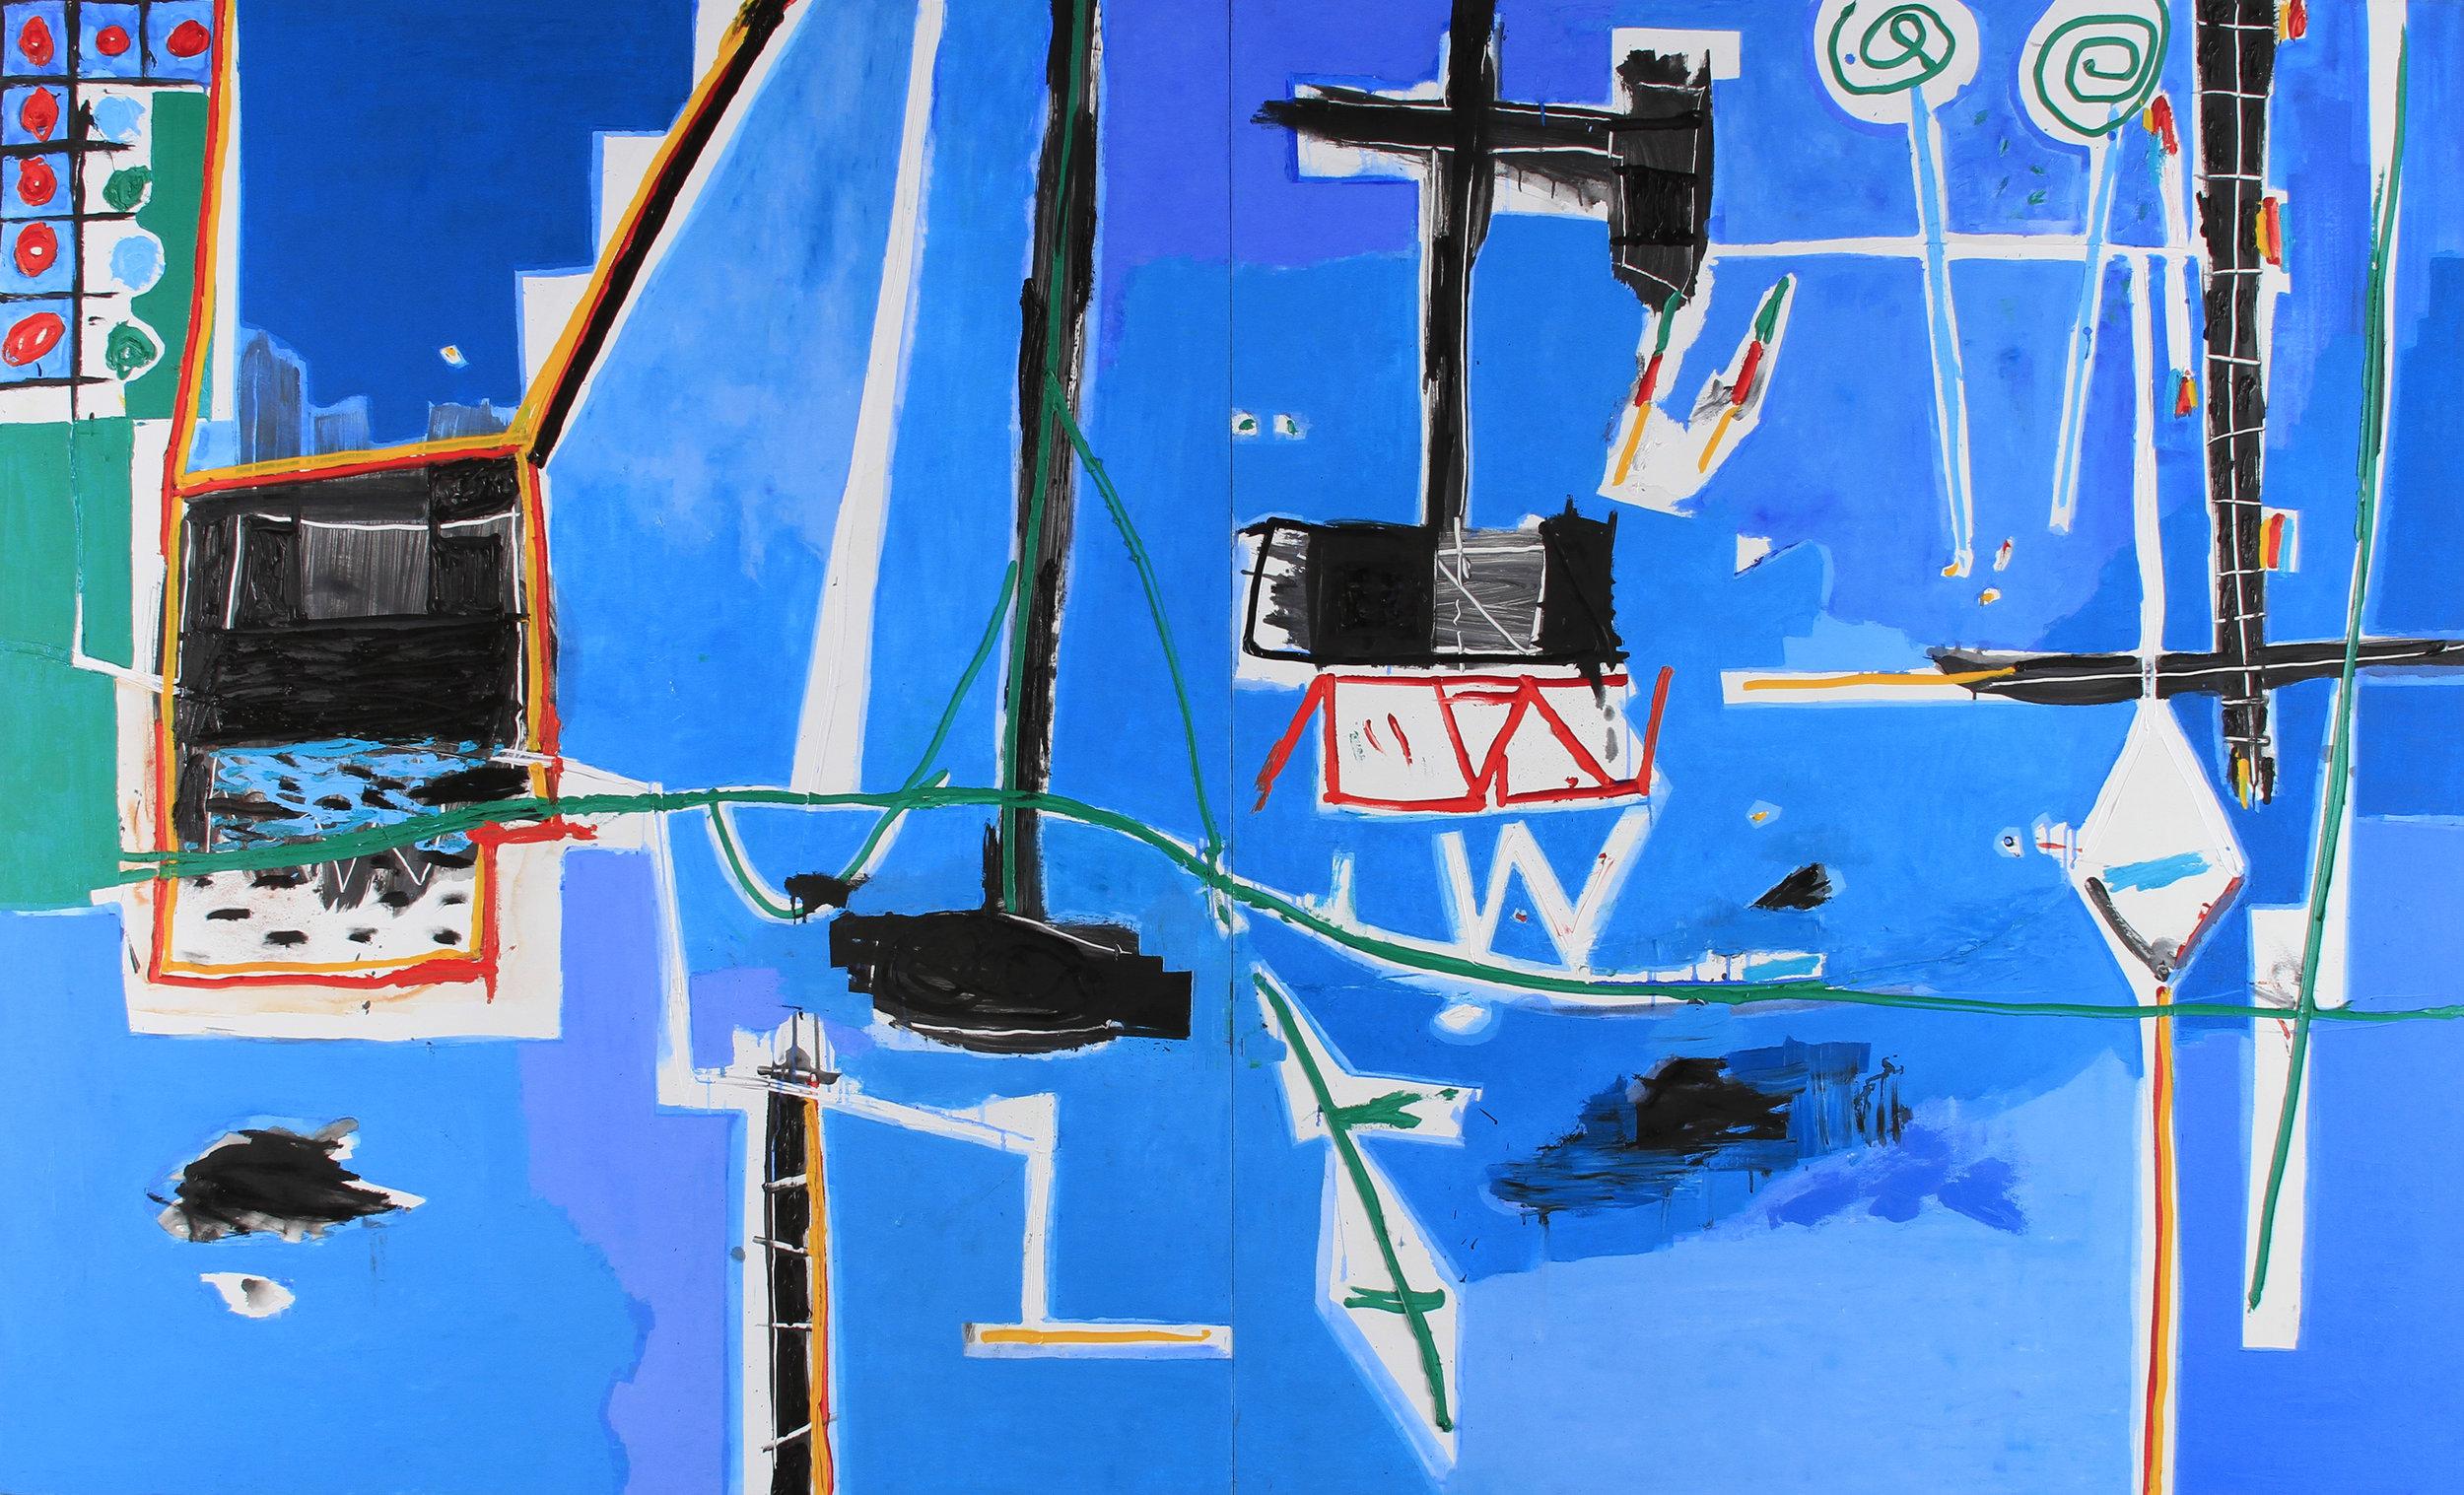 Gustavo Ramos Rivera, Calypso Bay, oil on canvas, 72 x 120 inches